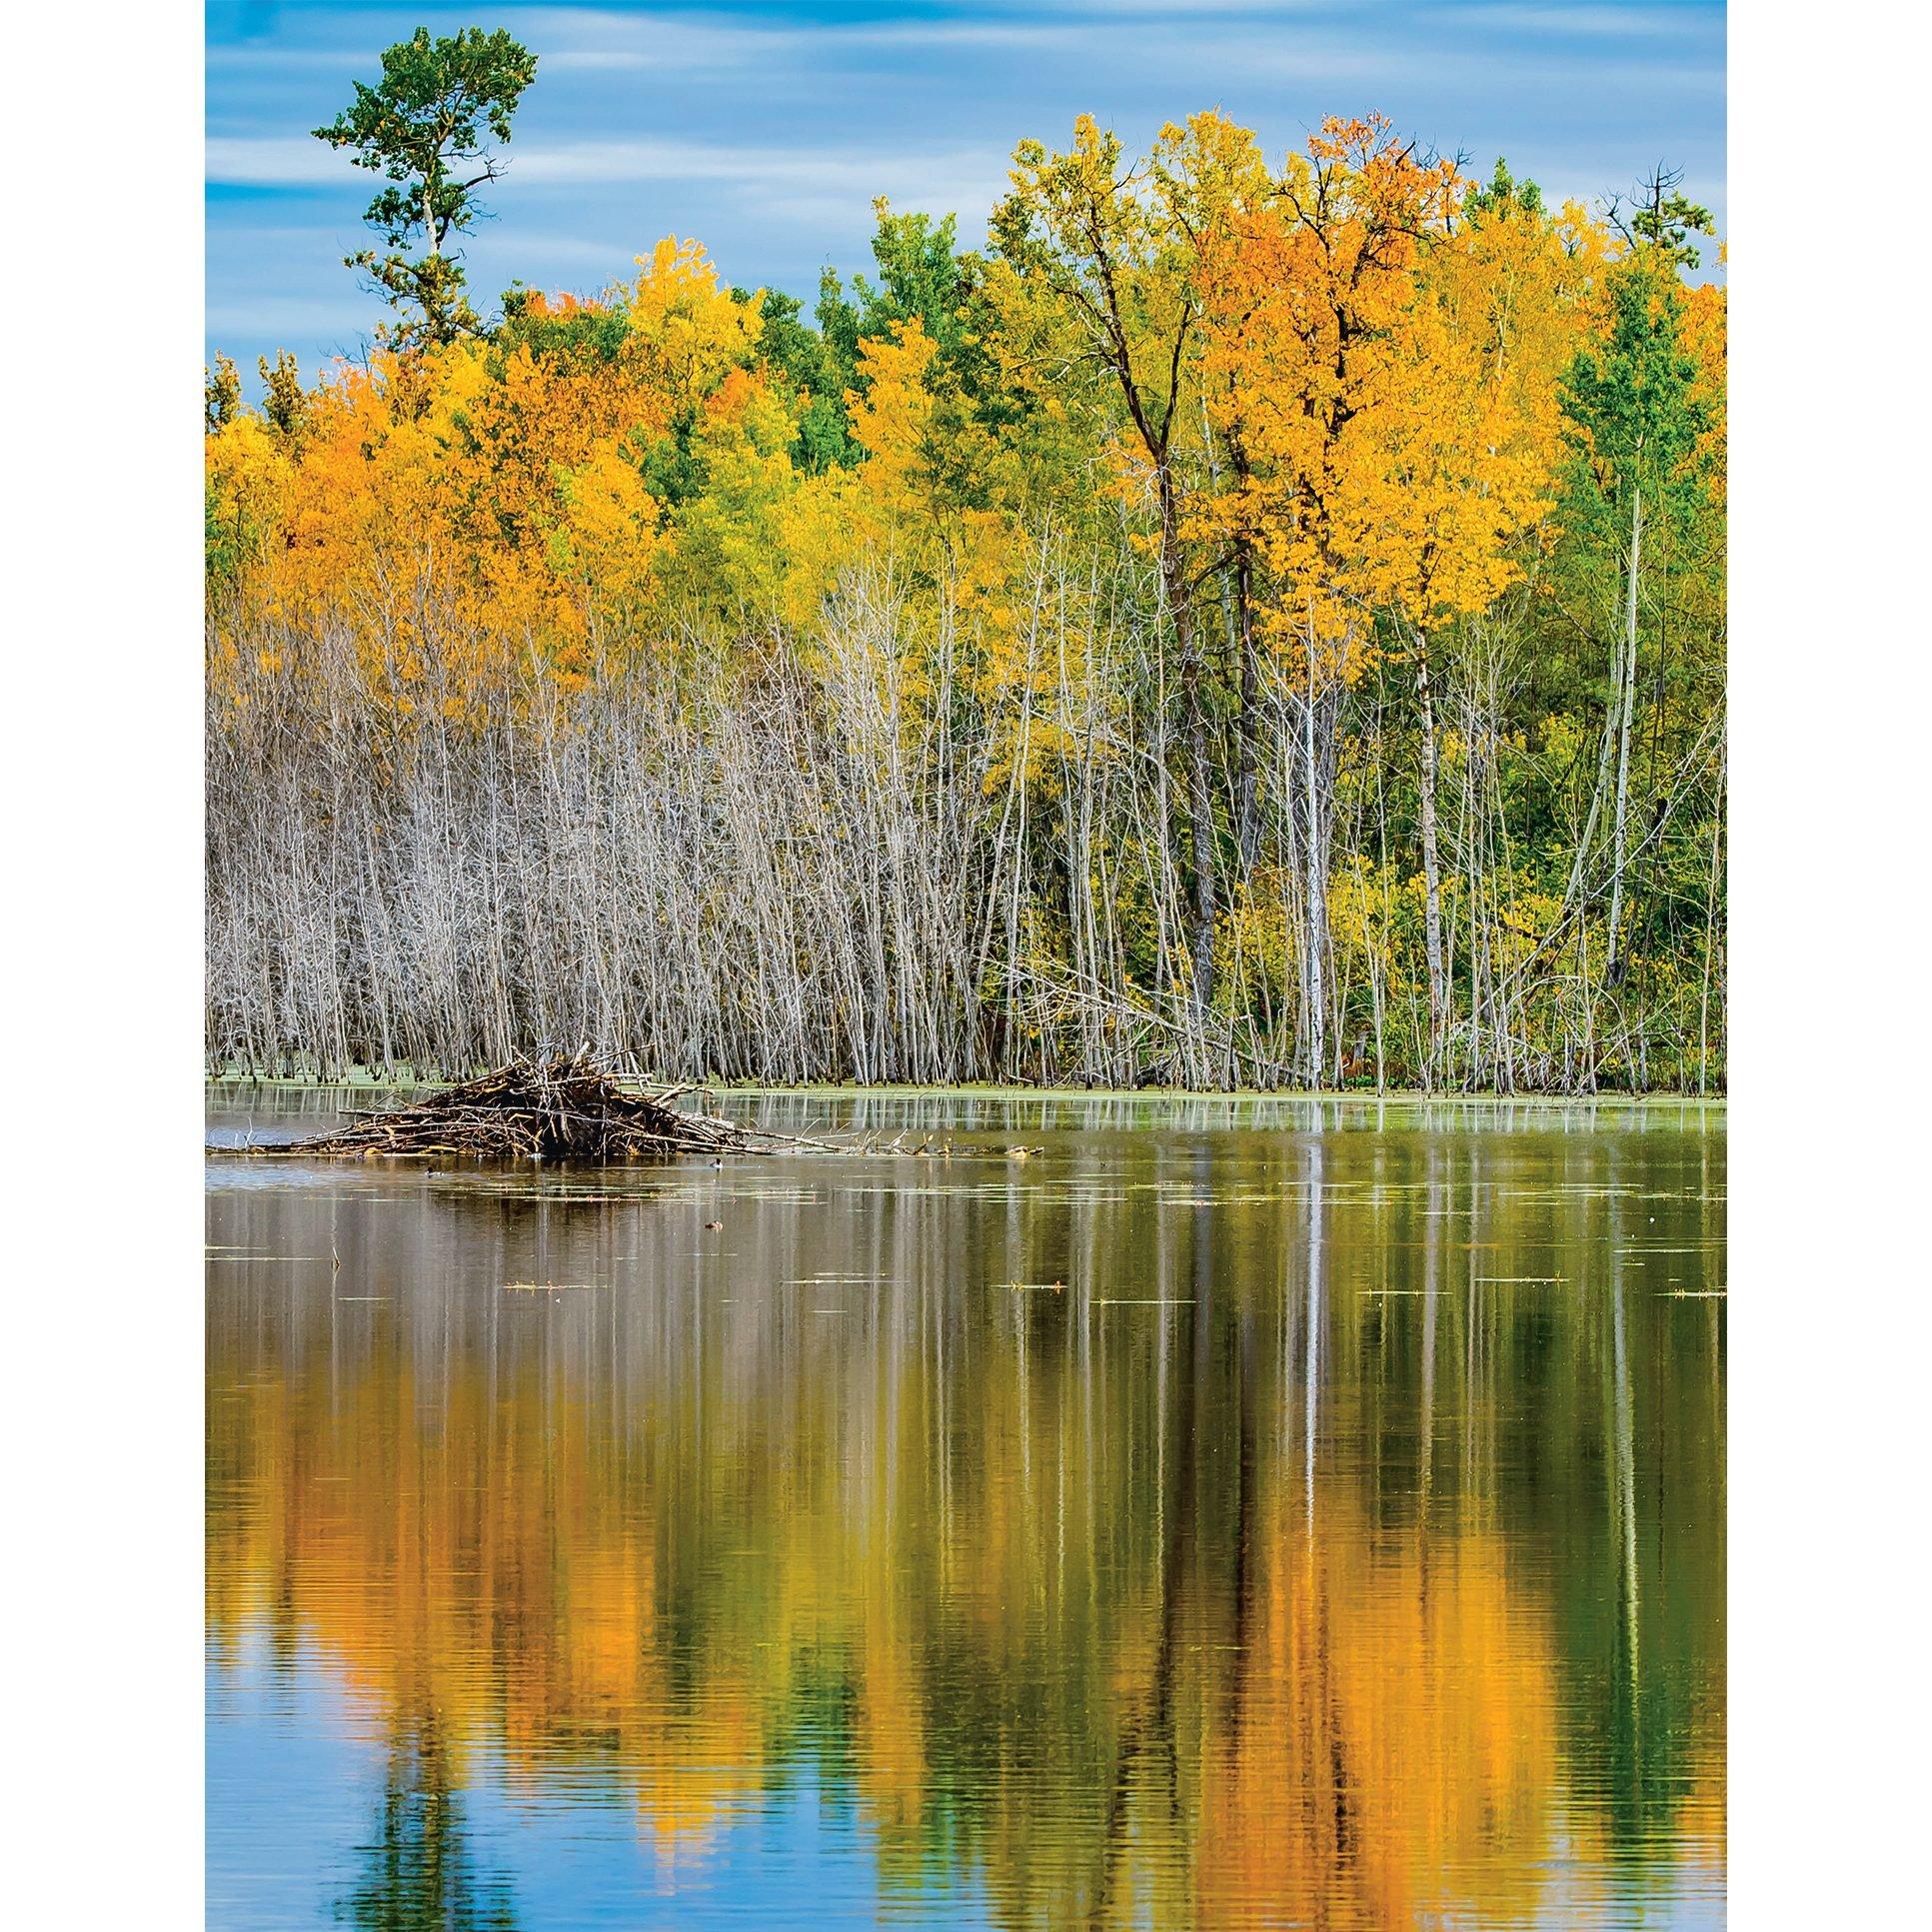 Autumn in Canada - fall foliage reflected in lake